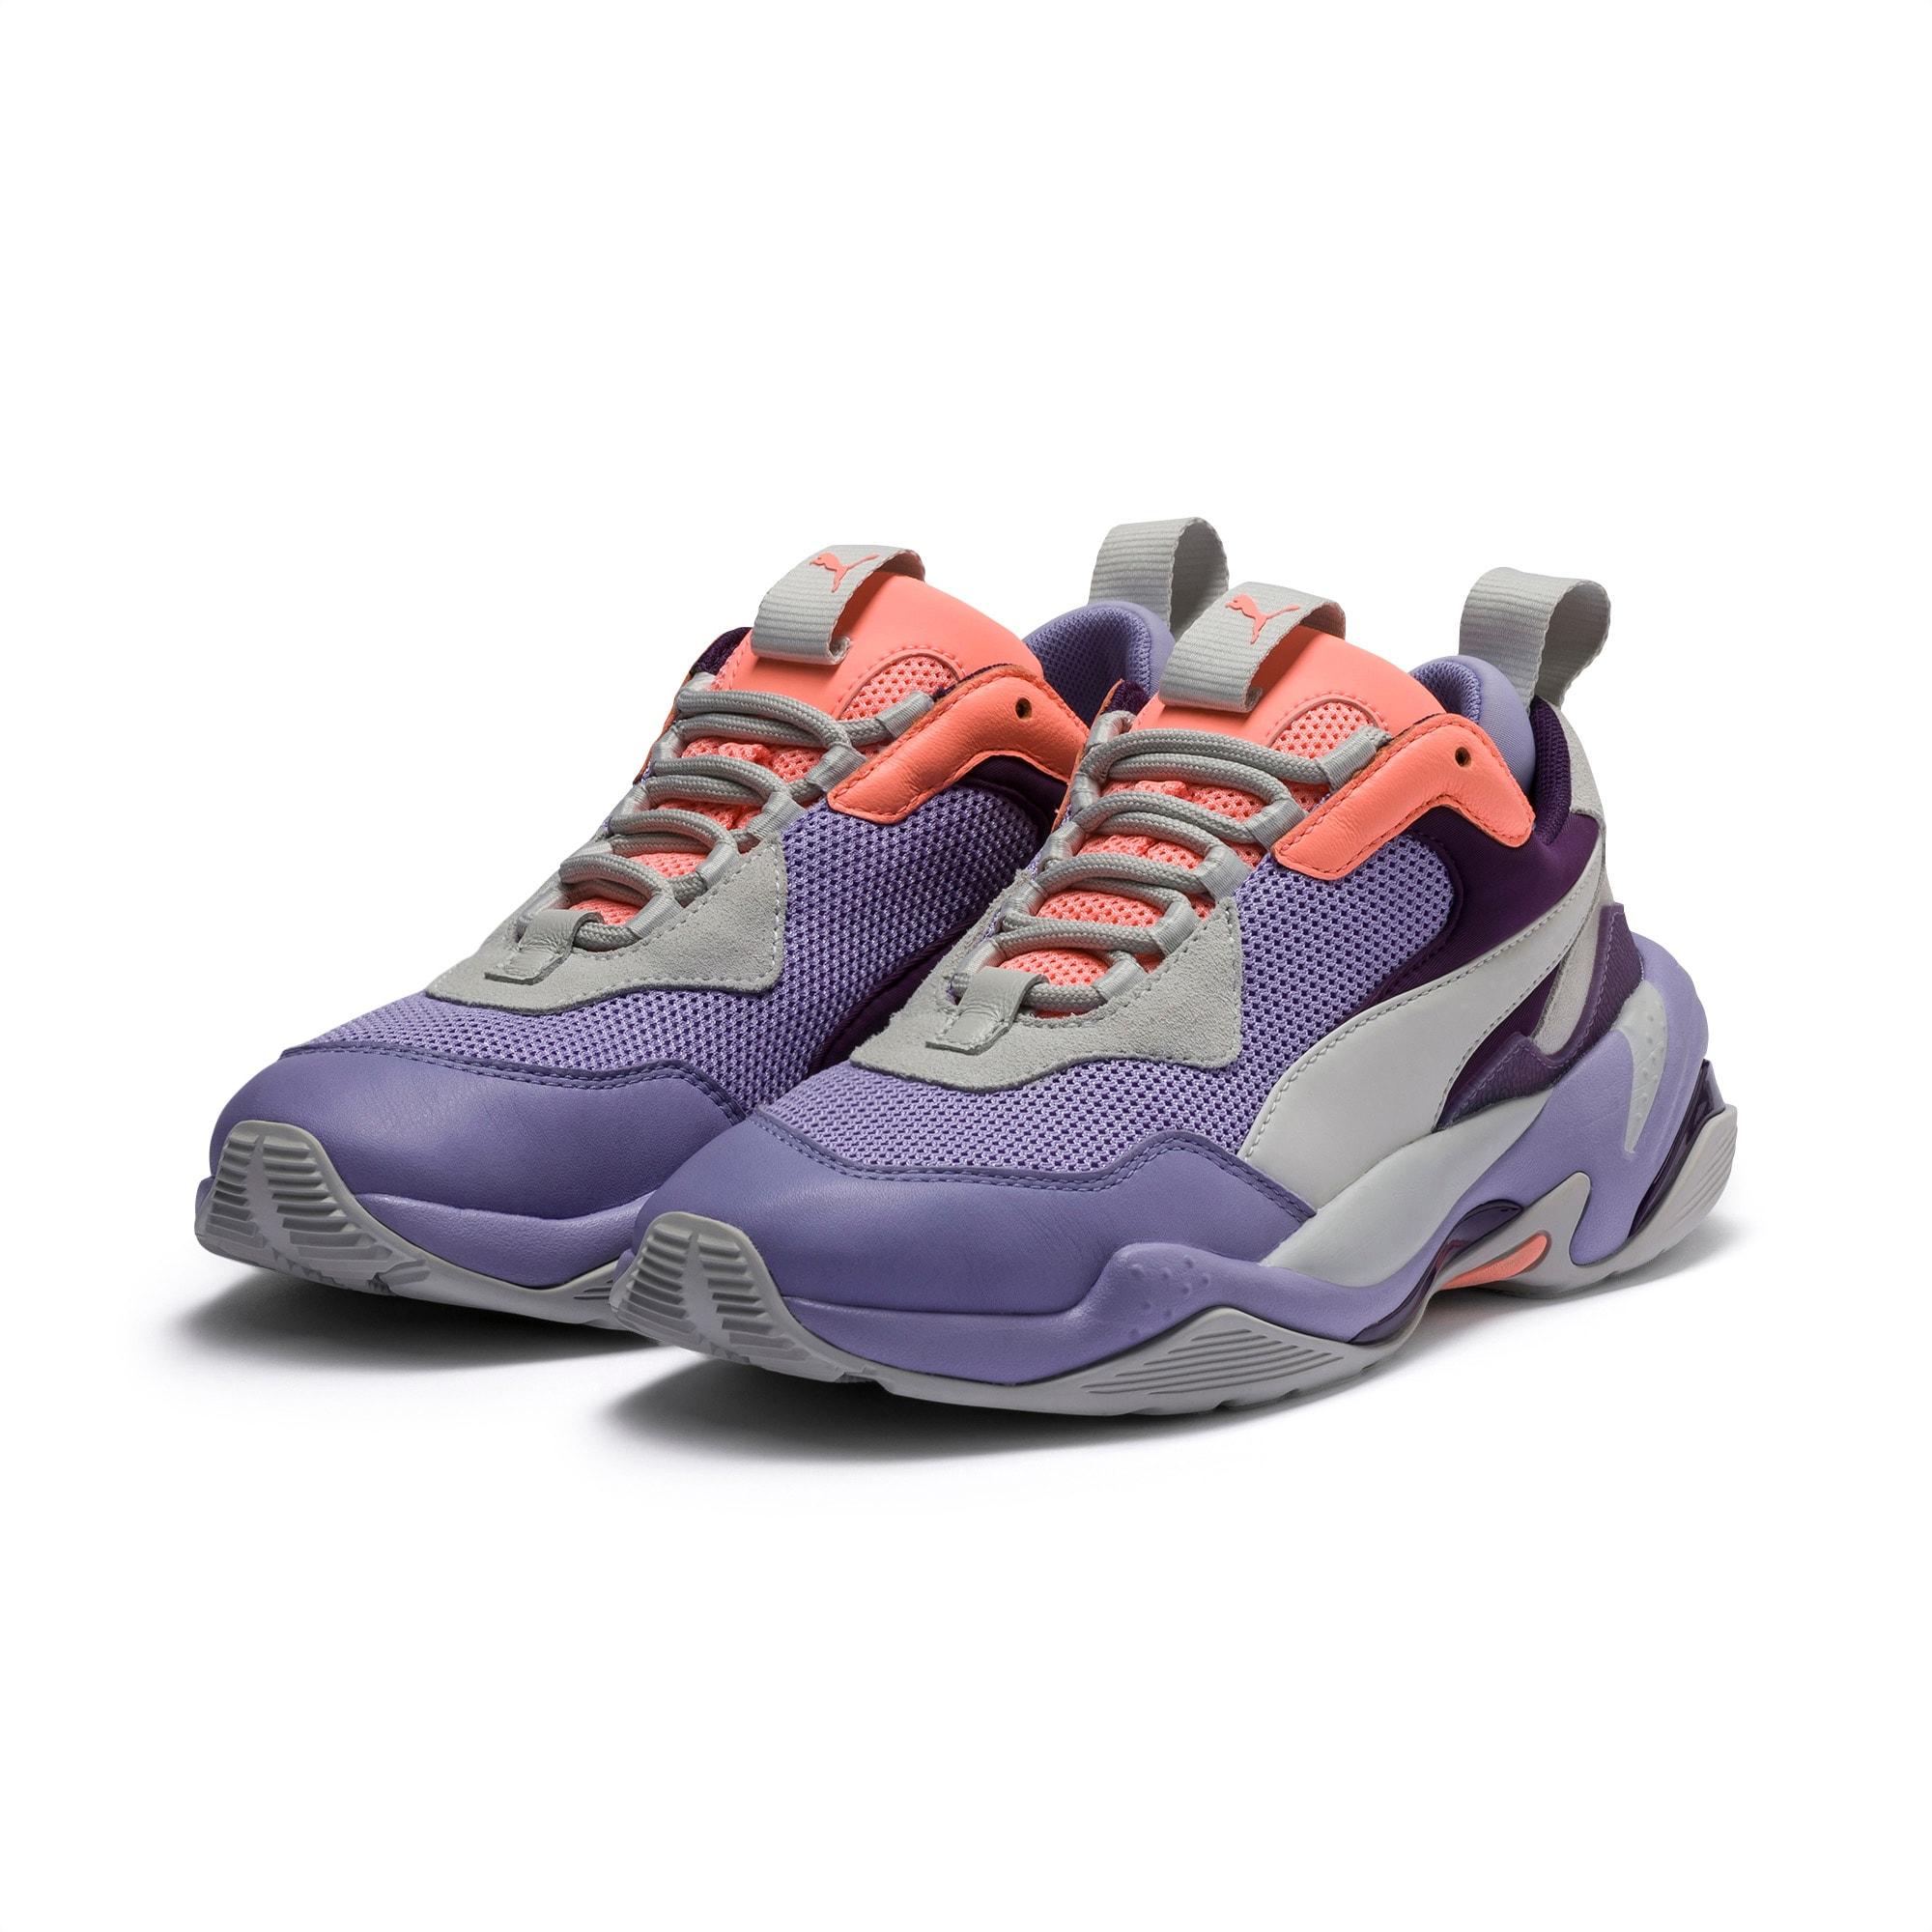 Thunder Spectra Sneaker | Sweet Lavender Bright Peach | PUMA